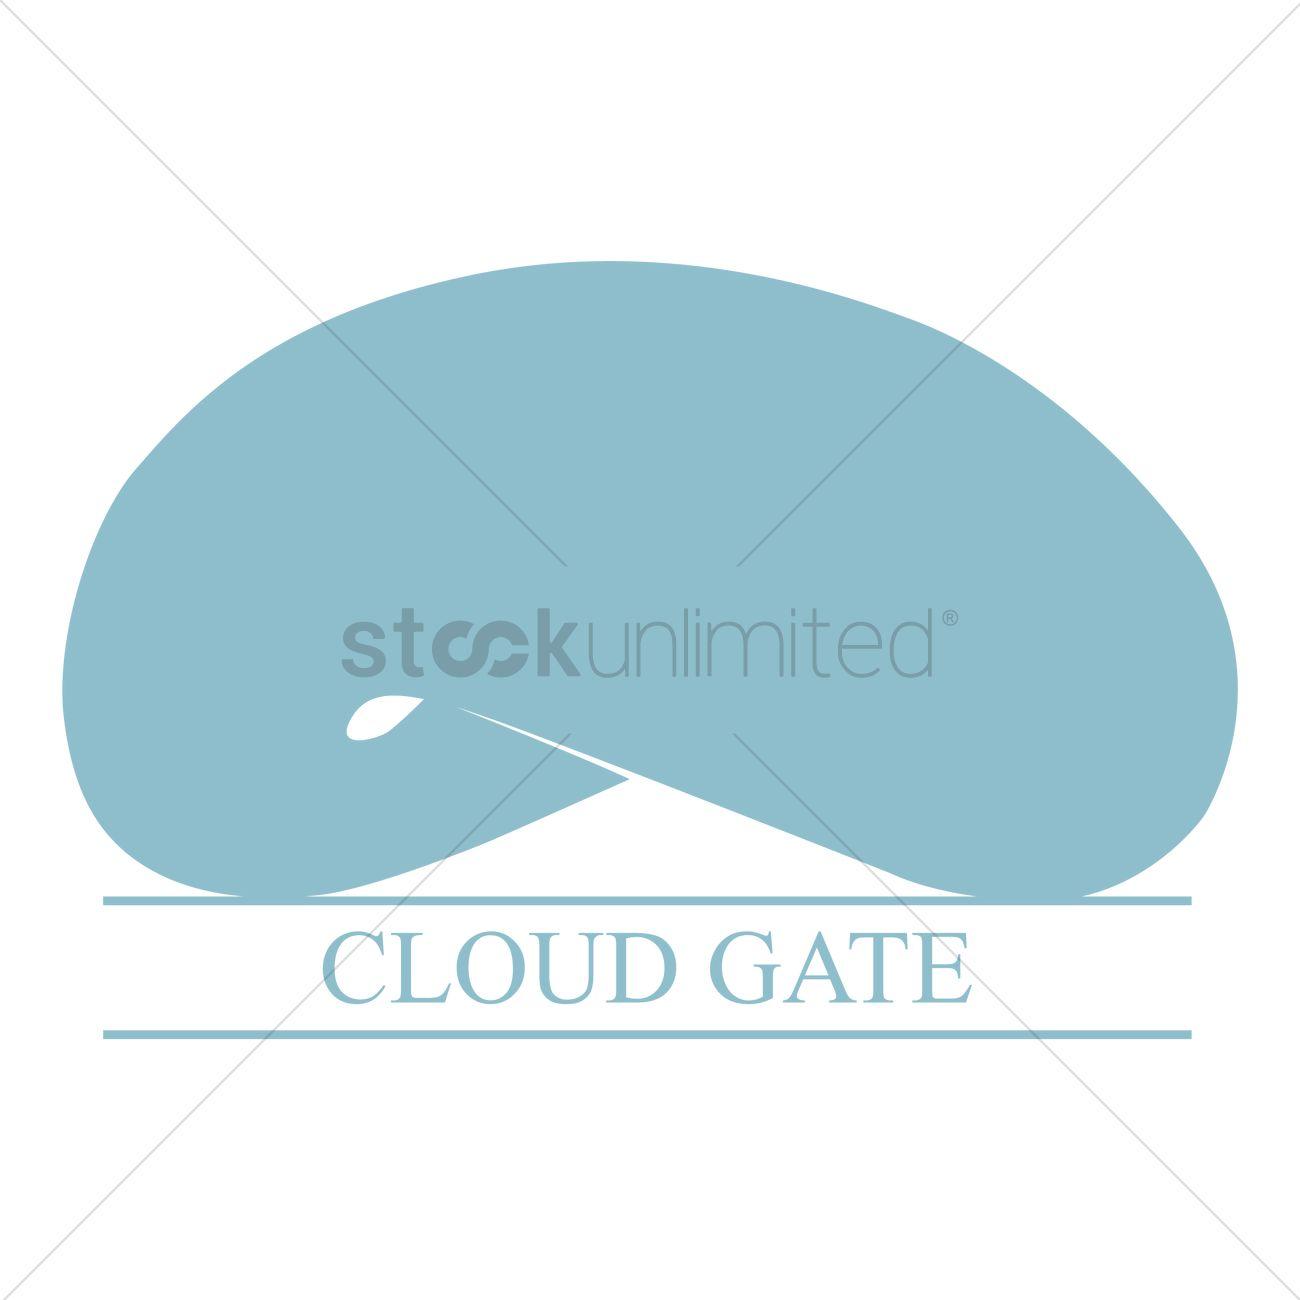 Cloud gate Vector Image.